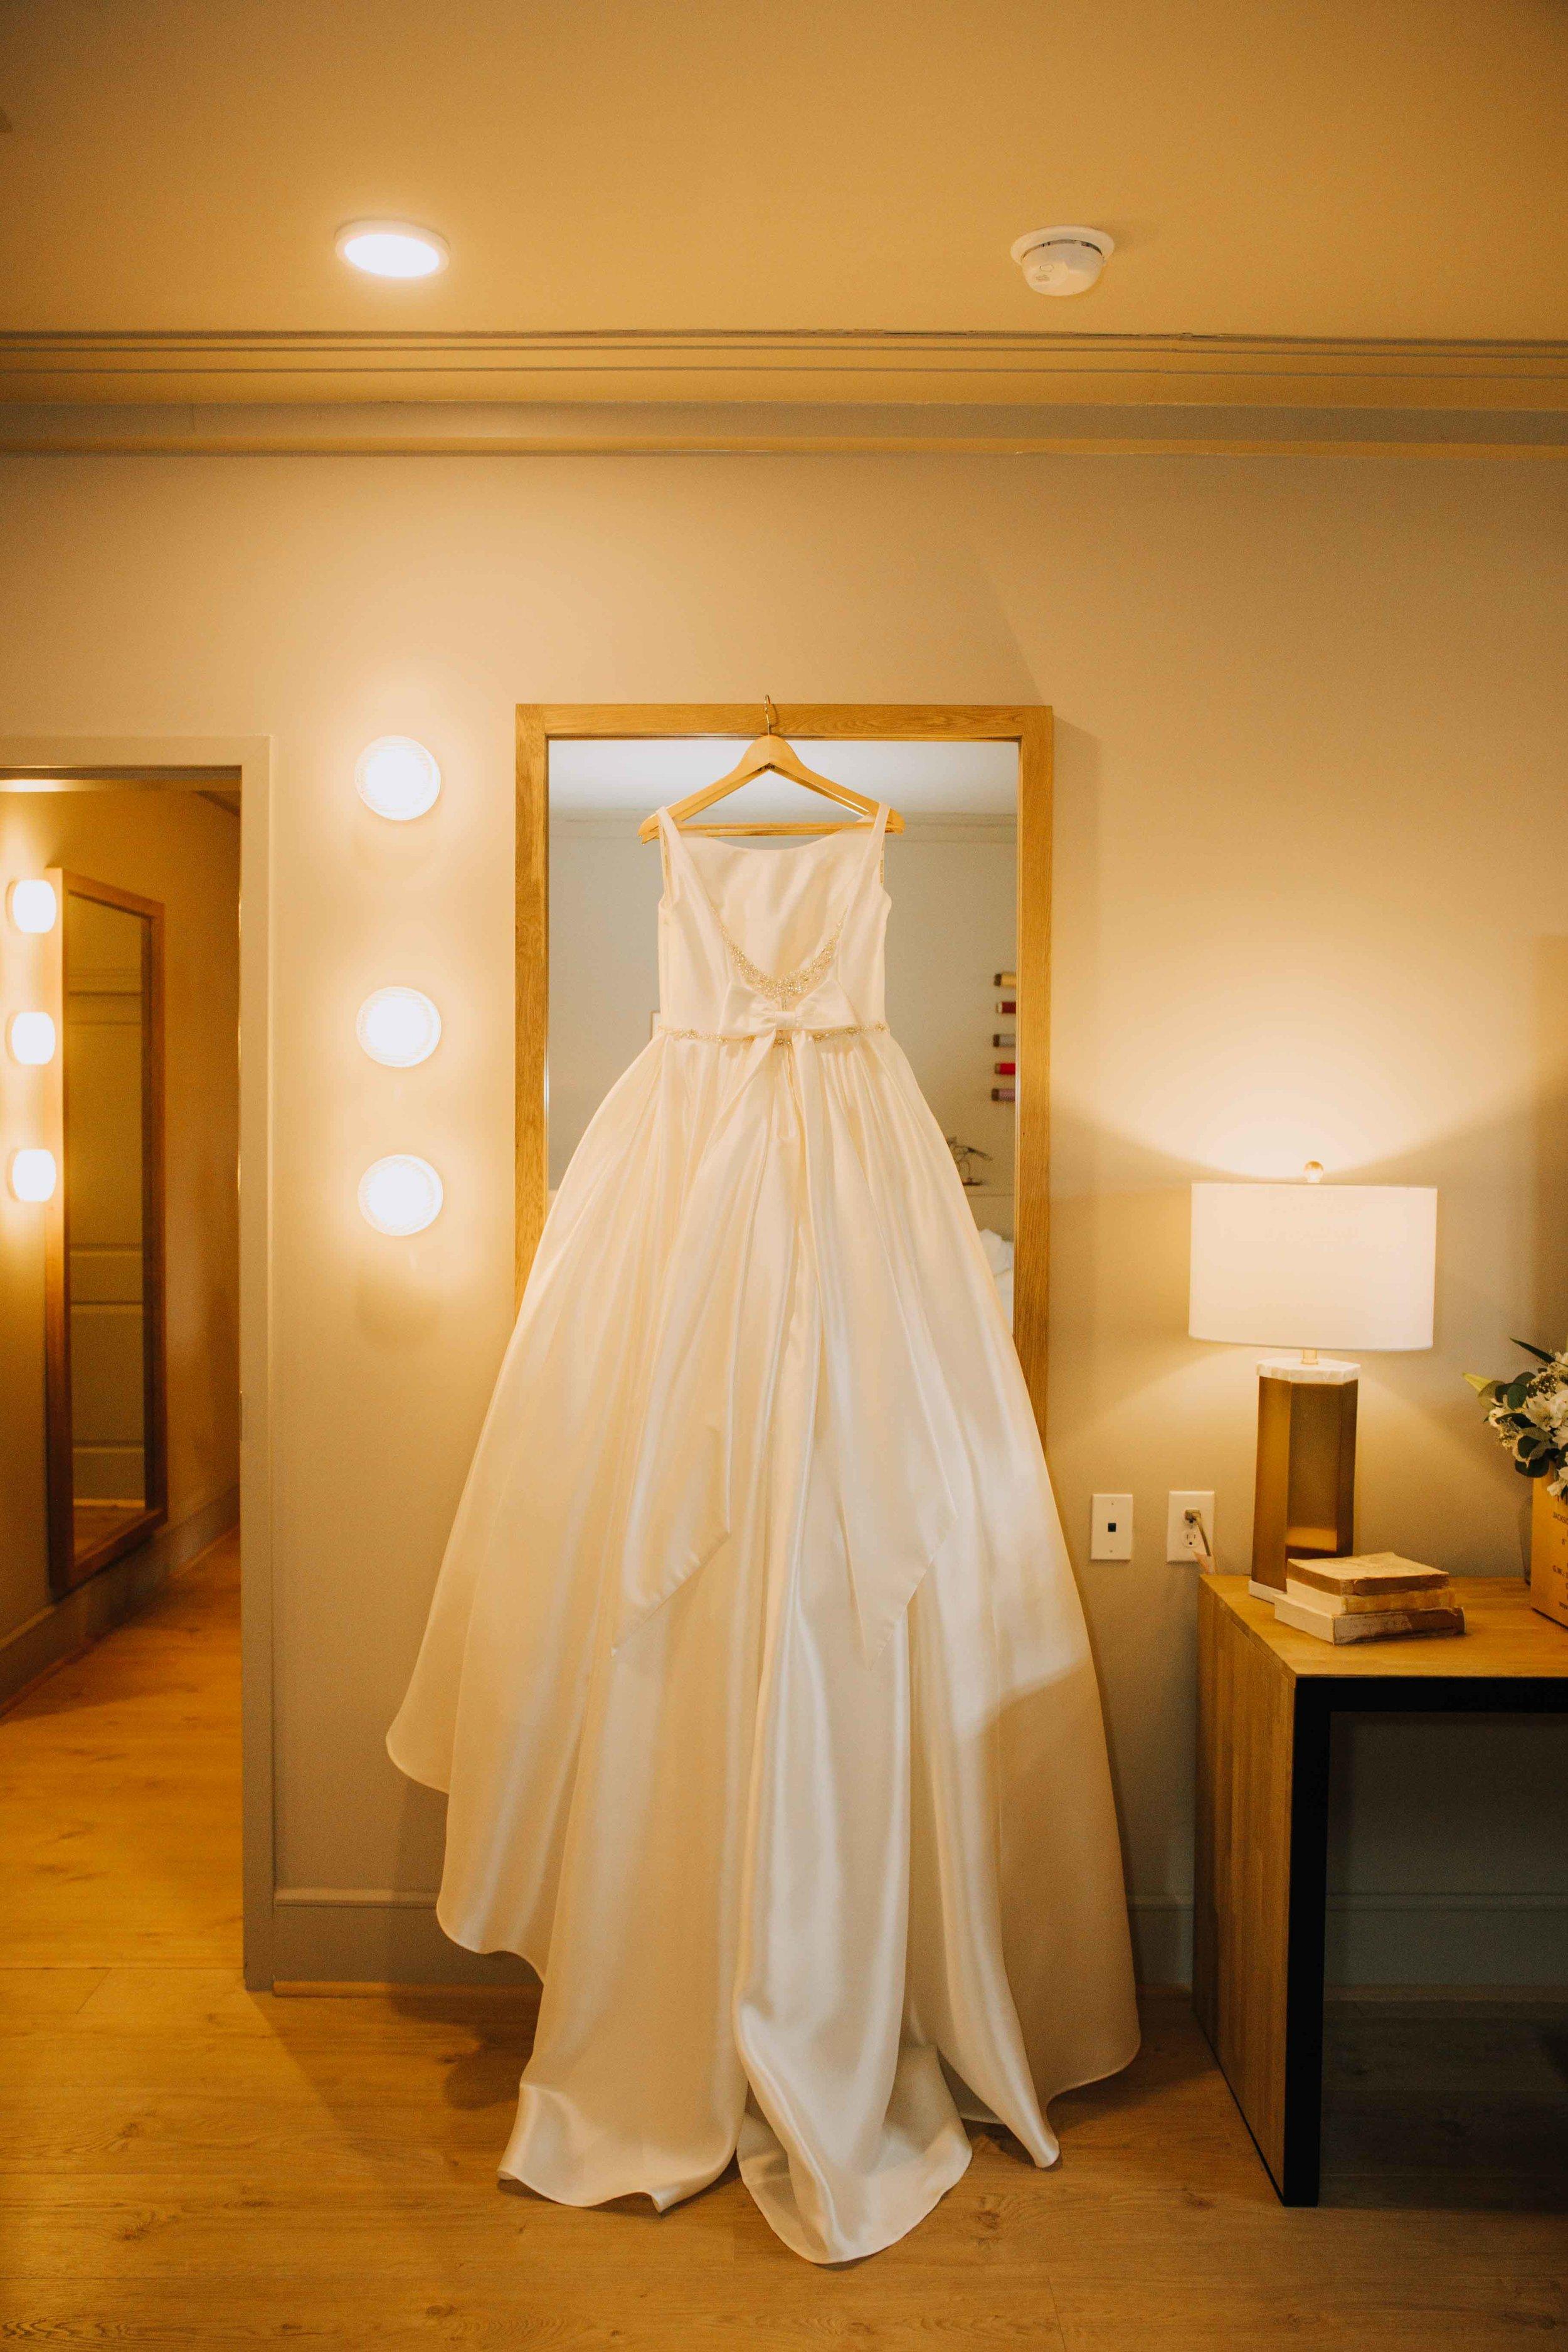 Farmville-Virginia-Wedding-Hotel-Weynoke-Downtown-Jacqueline-Waters-Photography-Detailed- (60).jpg